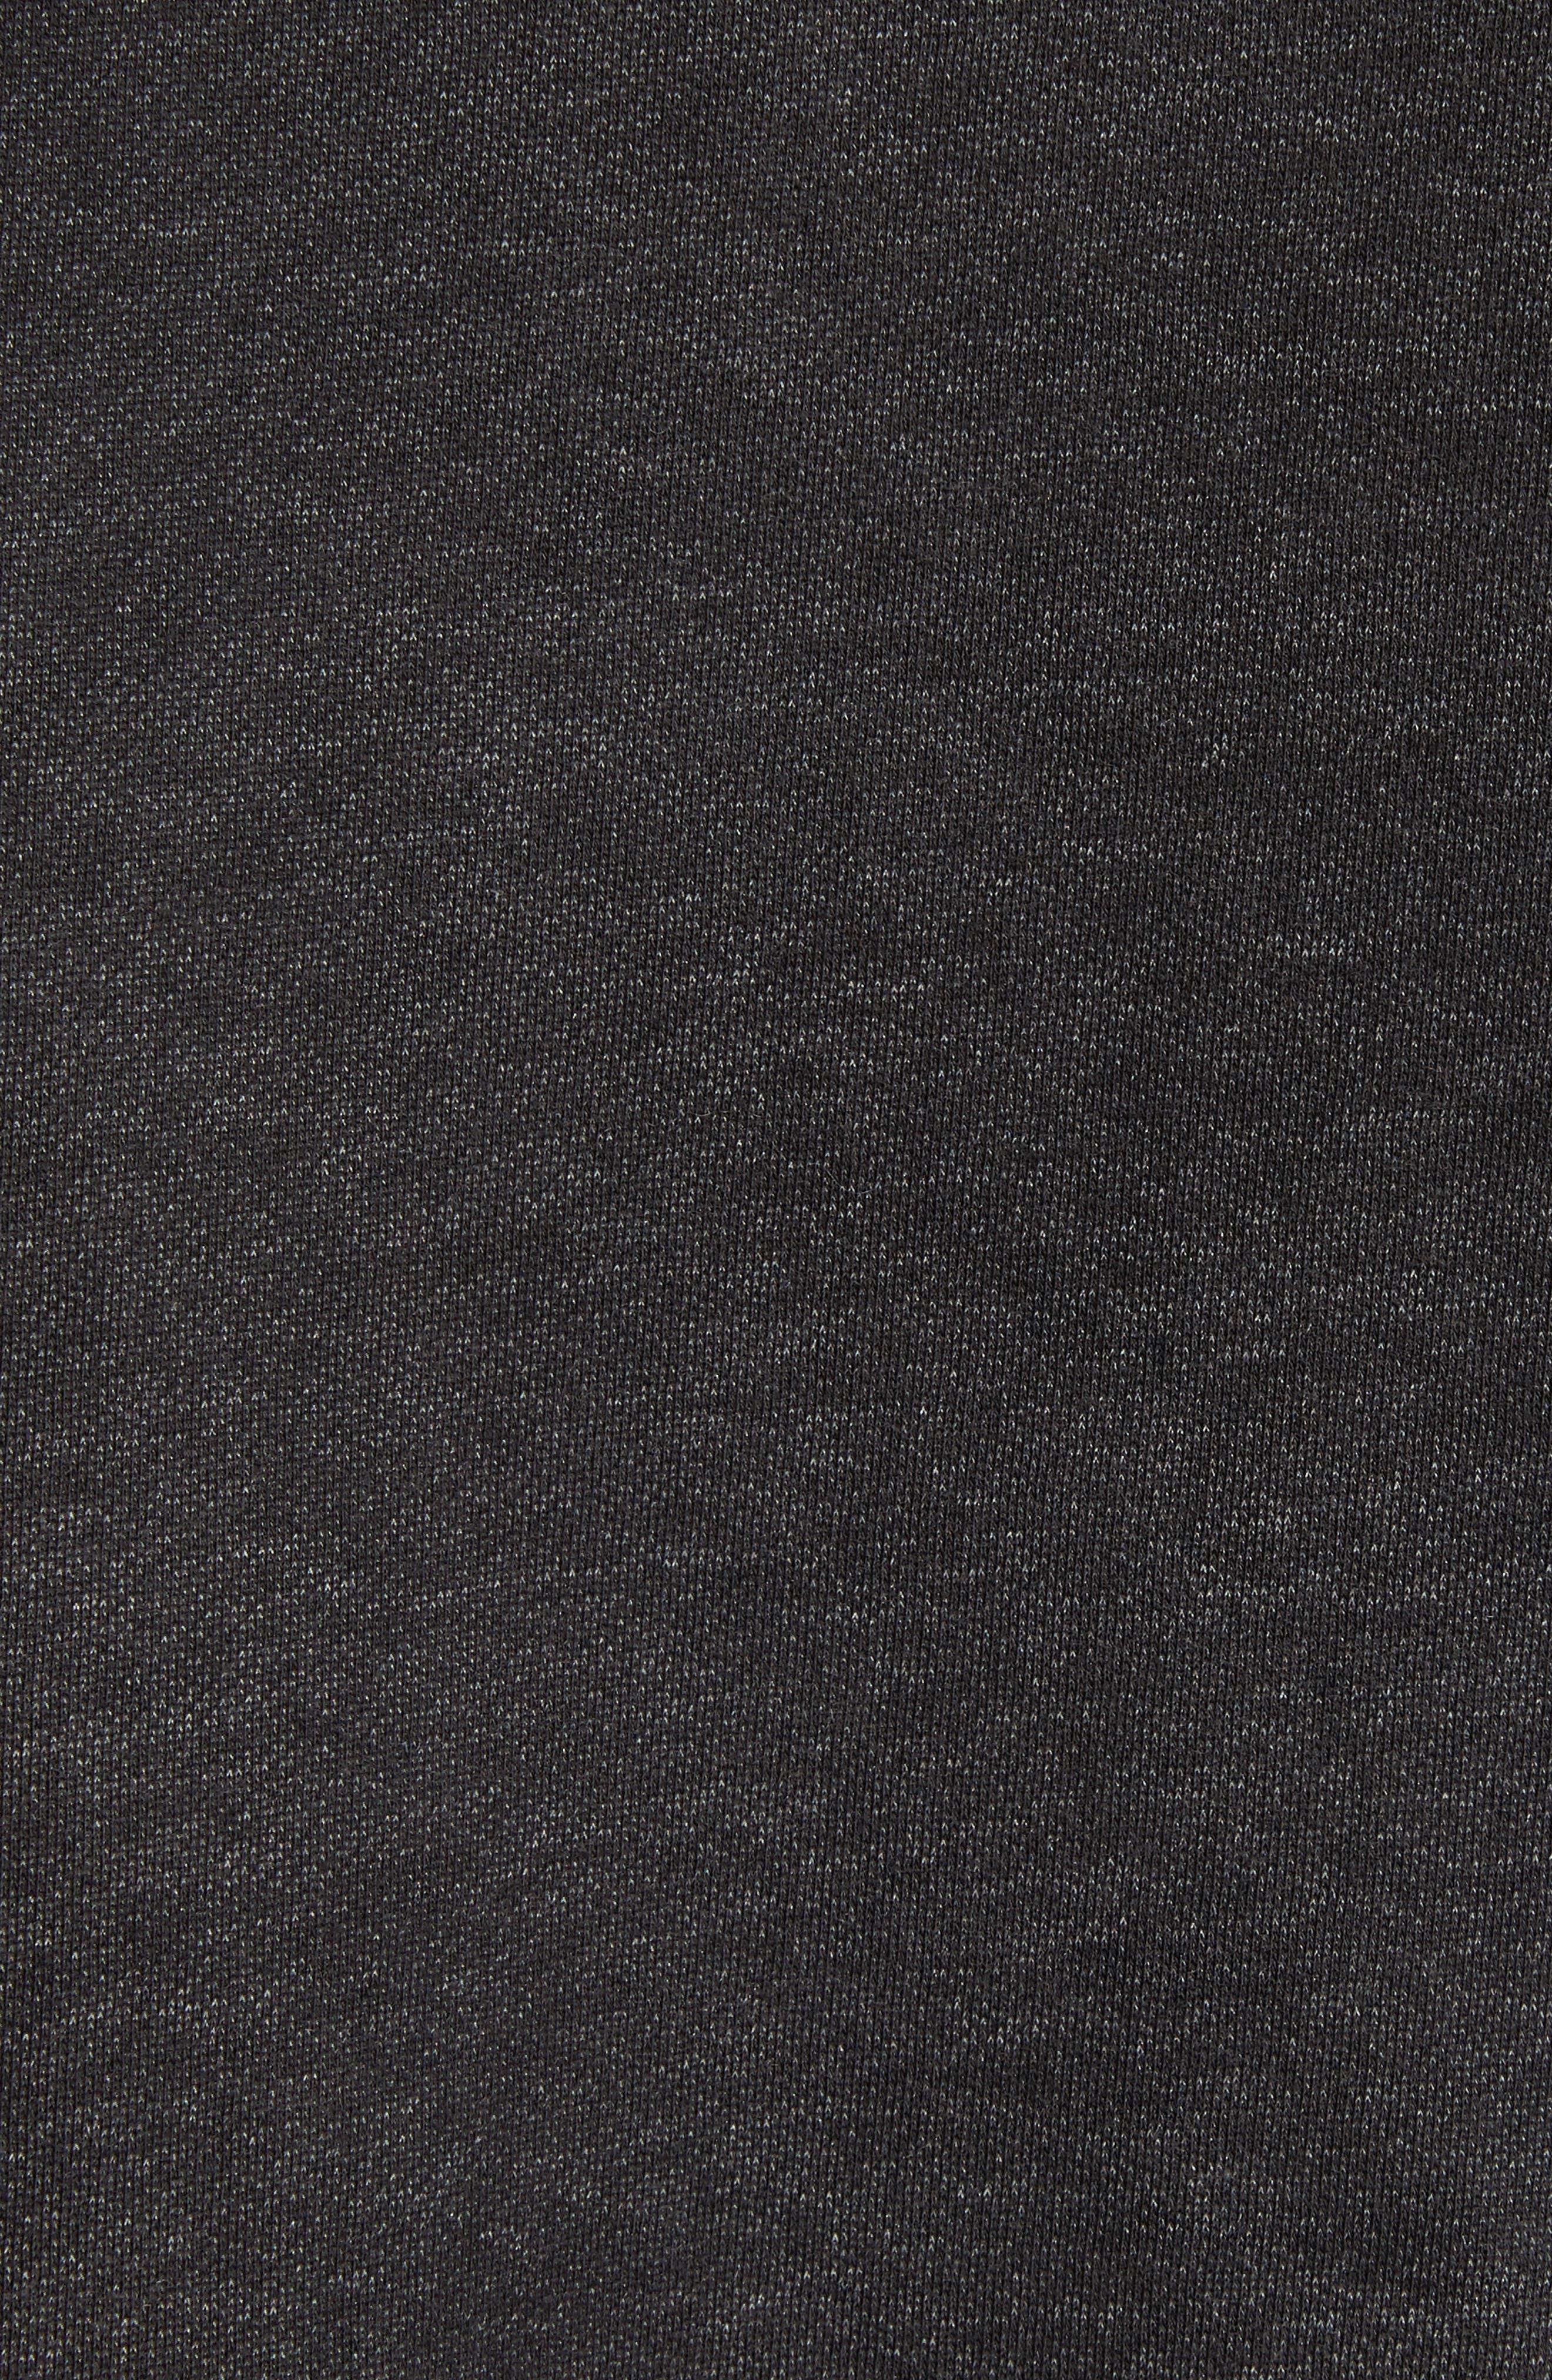 Oversize Pullover Hoodie,                             Alternate thumbnail 5, color,                             Acid Black